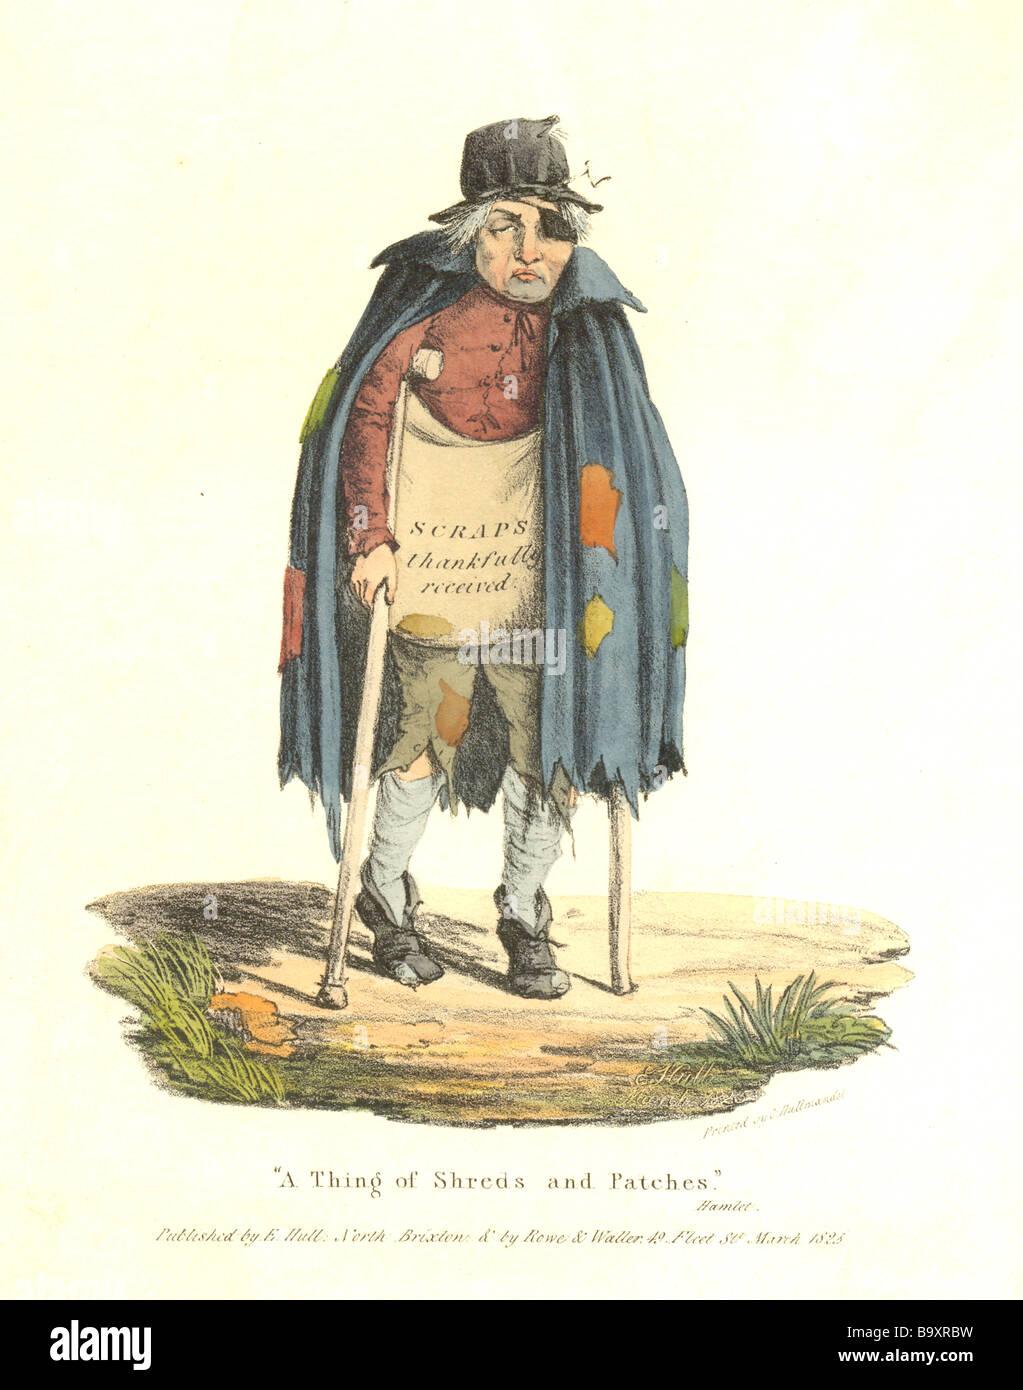 Scrap album frontispiece printed by C Hullmandel 1825 - Stock Image